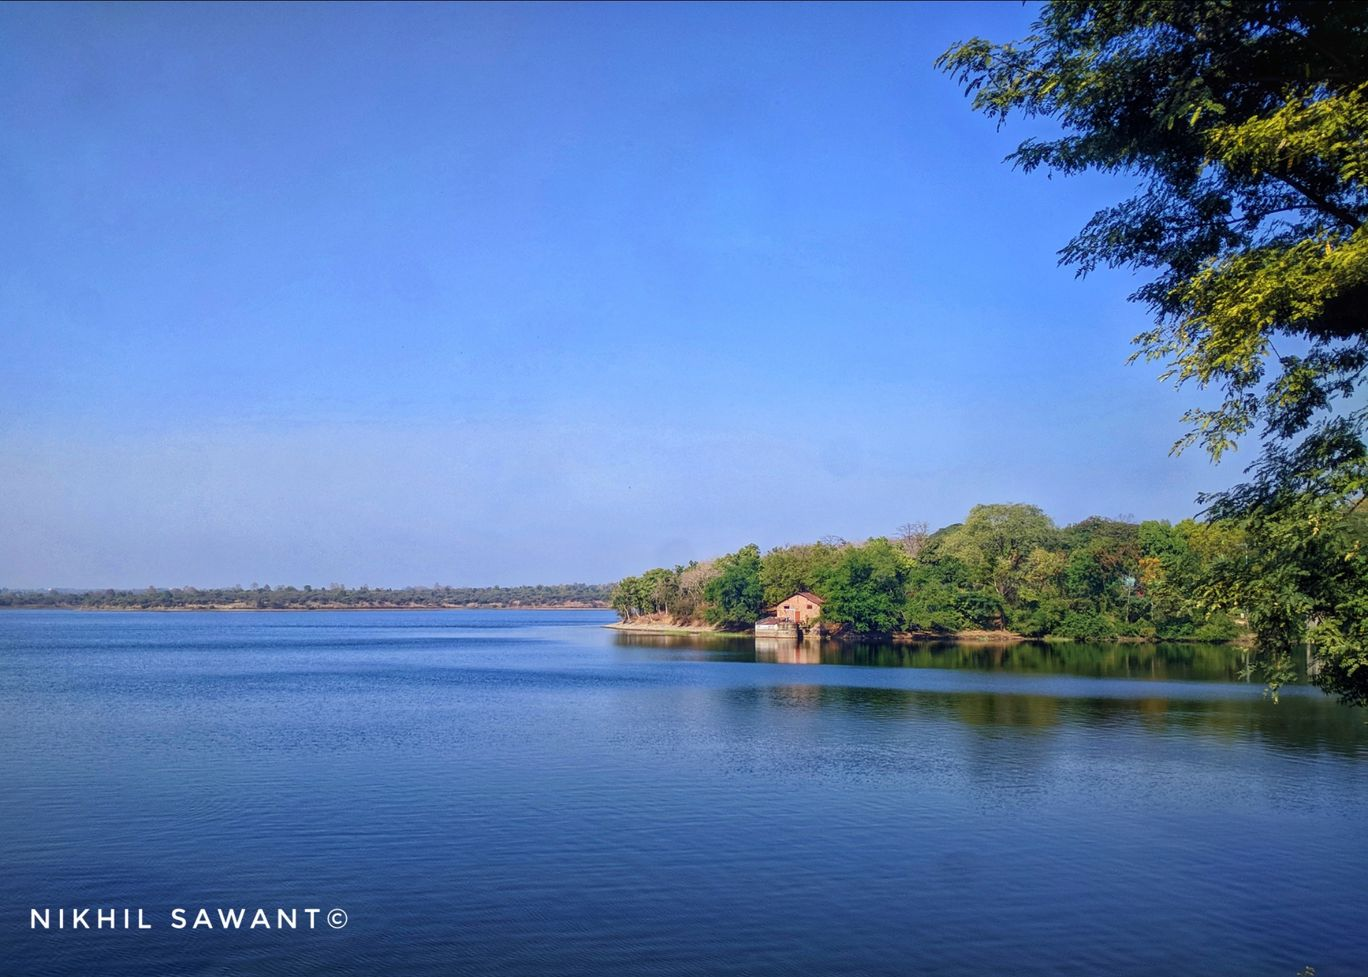 Photo of Nagpur By Nikhil Sawant